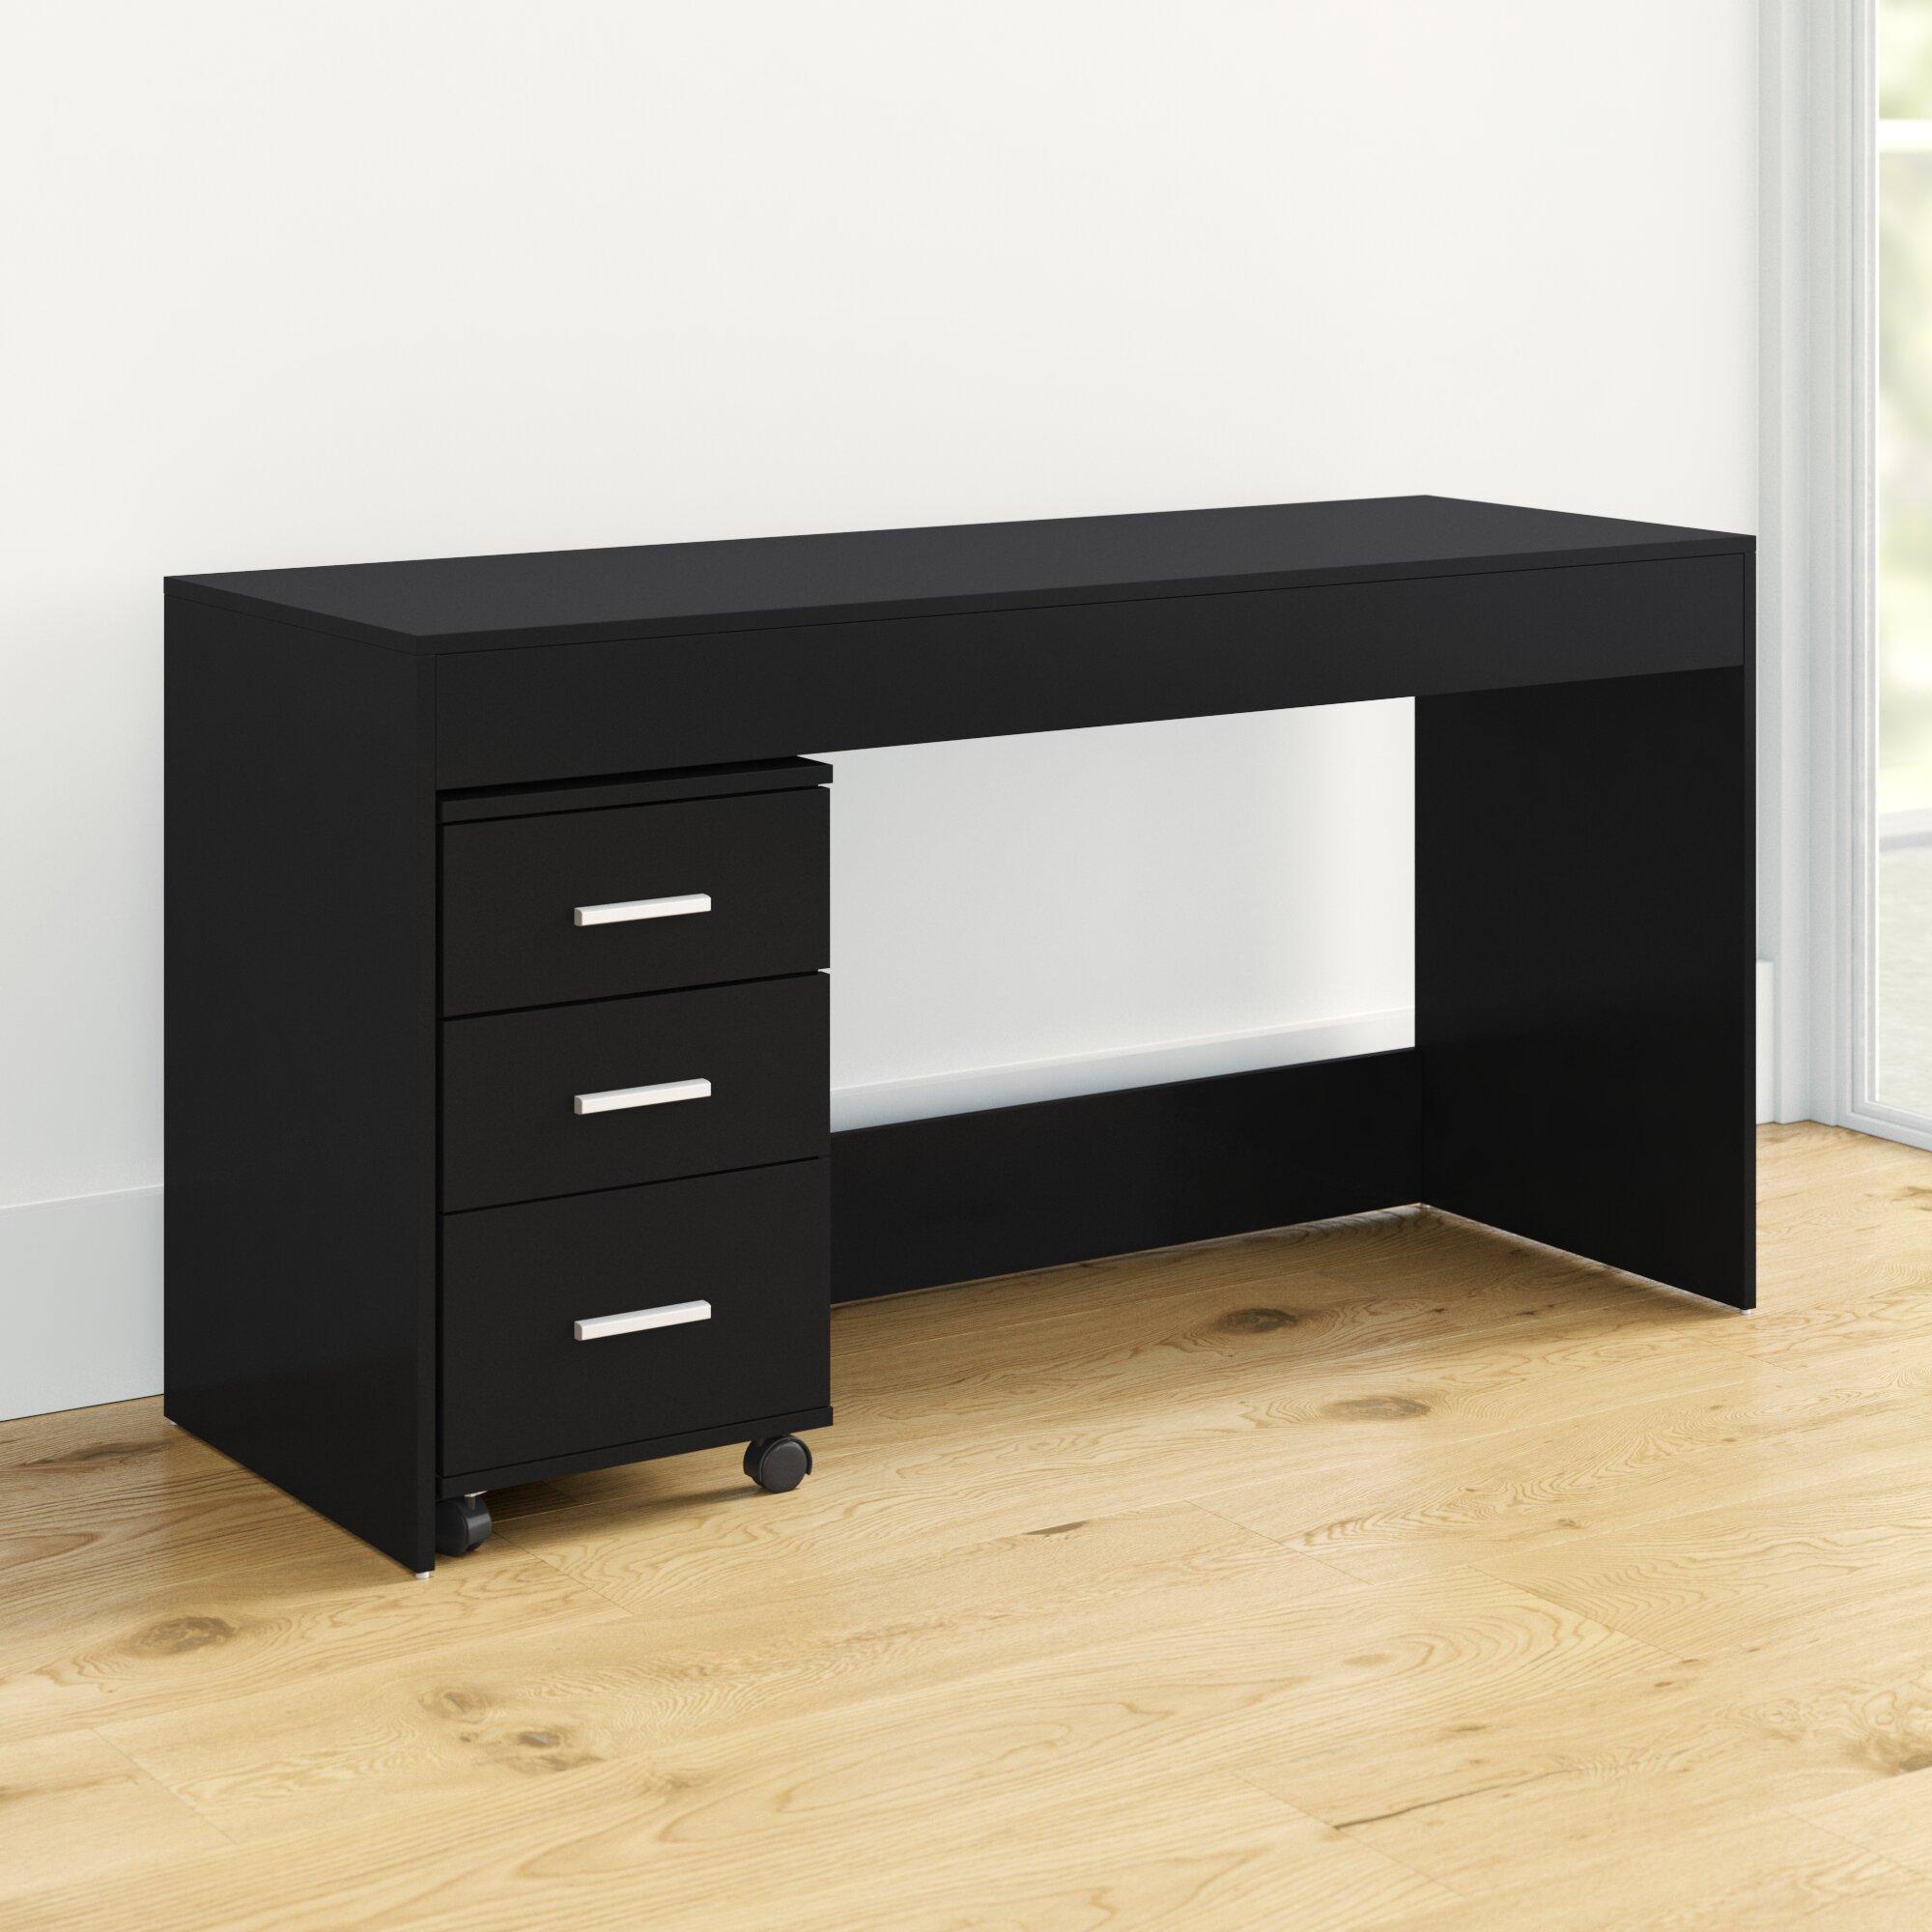 Latitude Run Remillard Simple Style Work Desk Reviews Wayfair